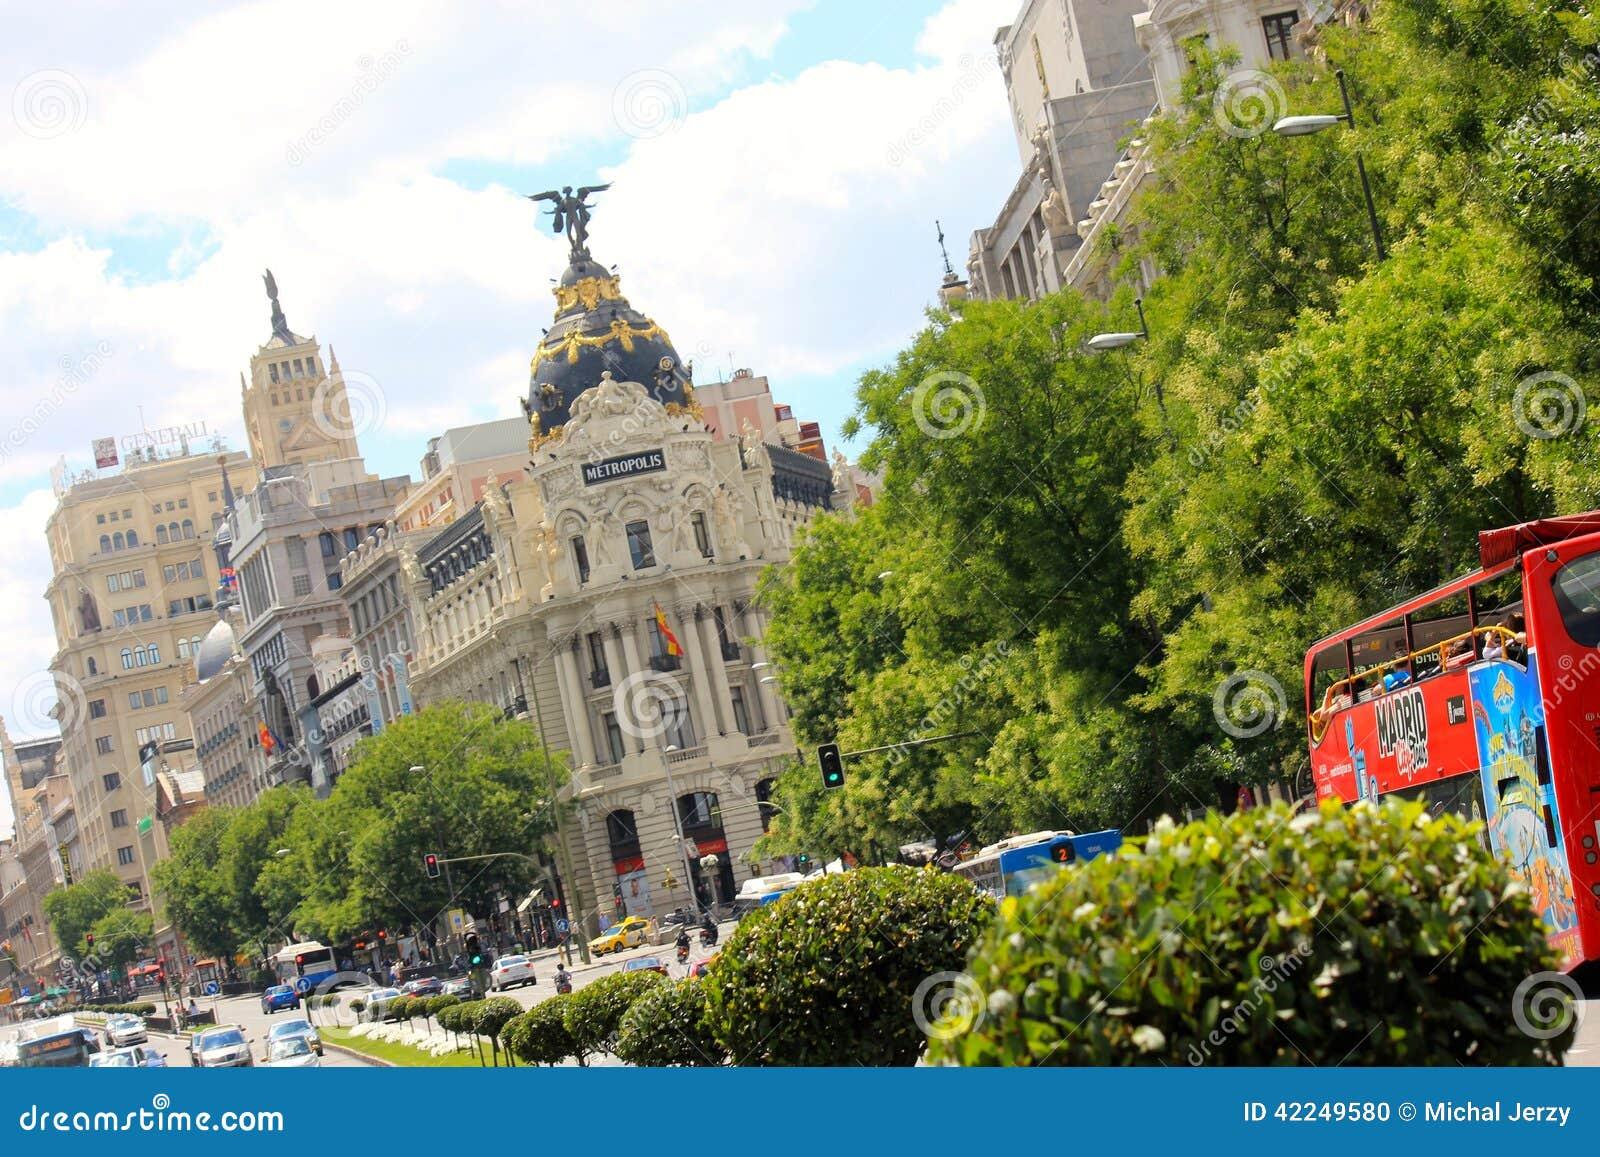 Madrid, Spain Tourism